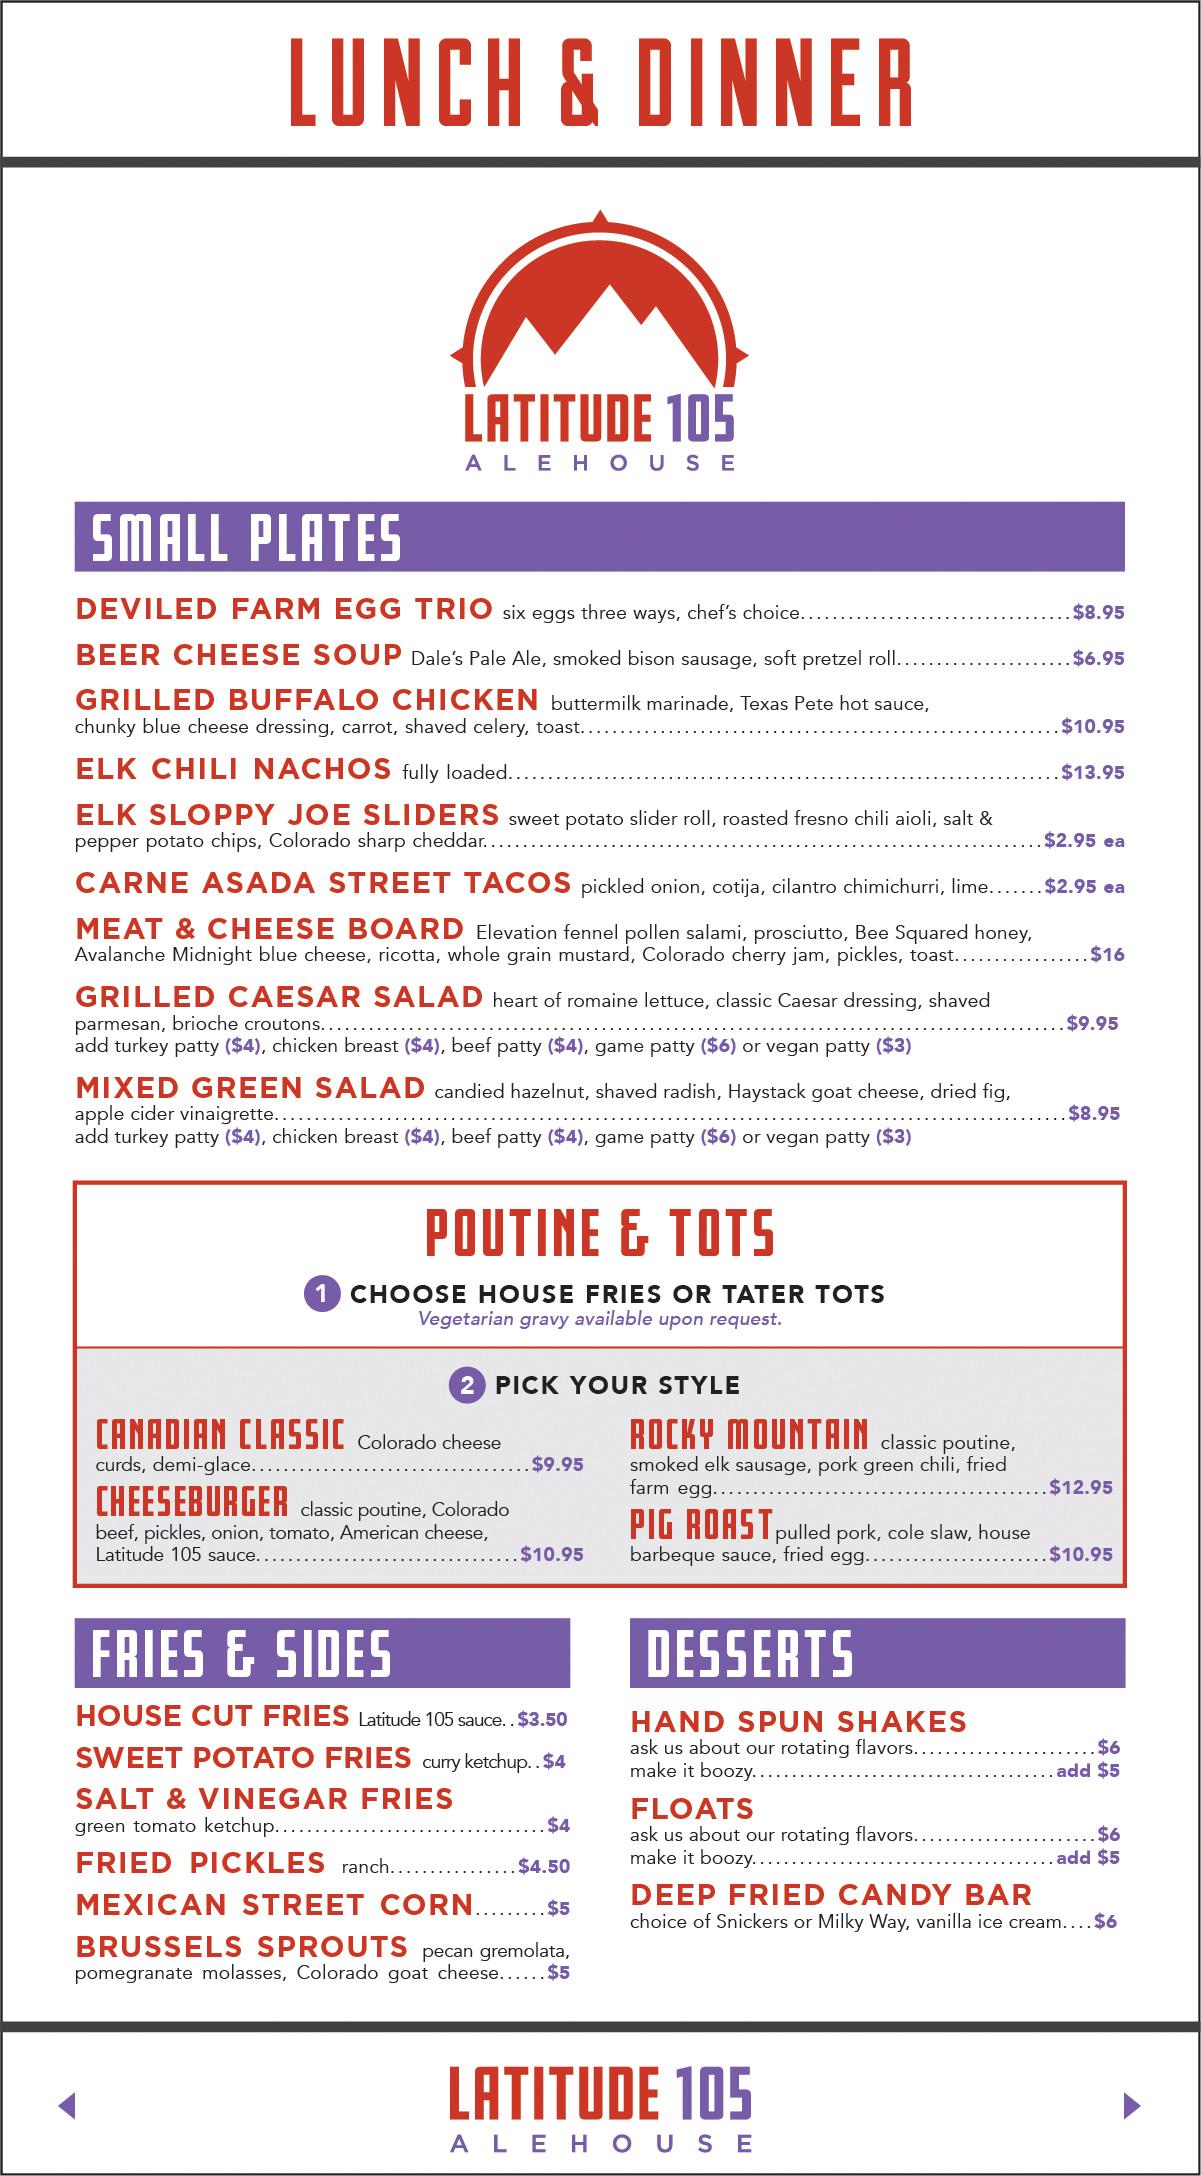 latitude105_dinner_menu_front